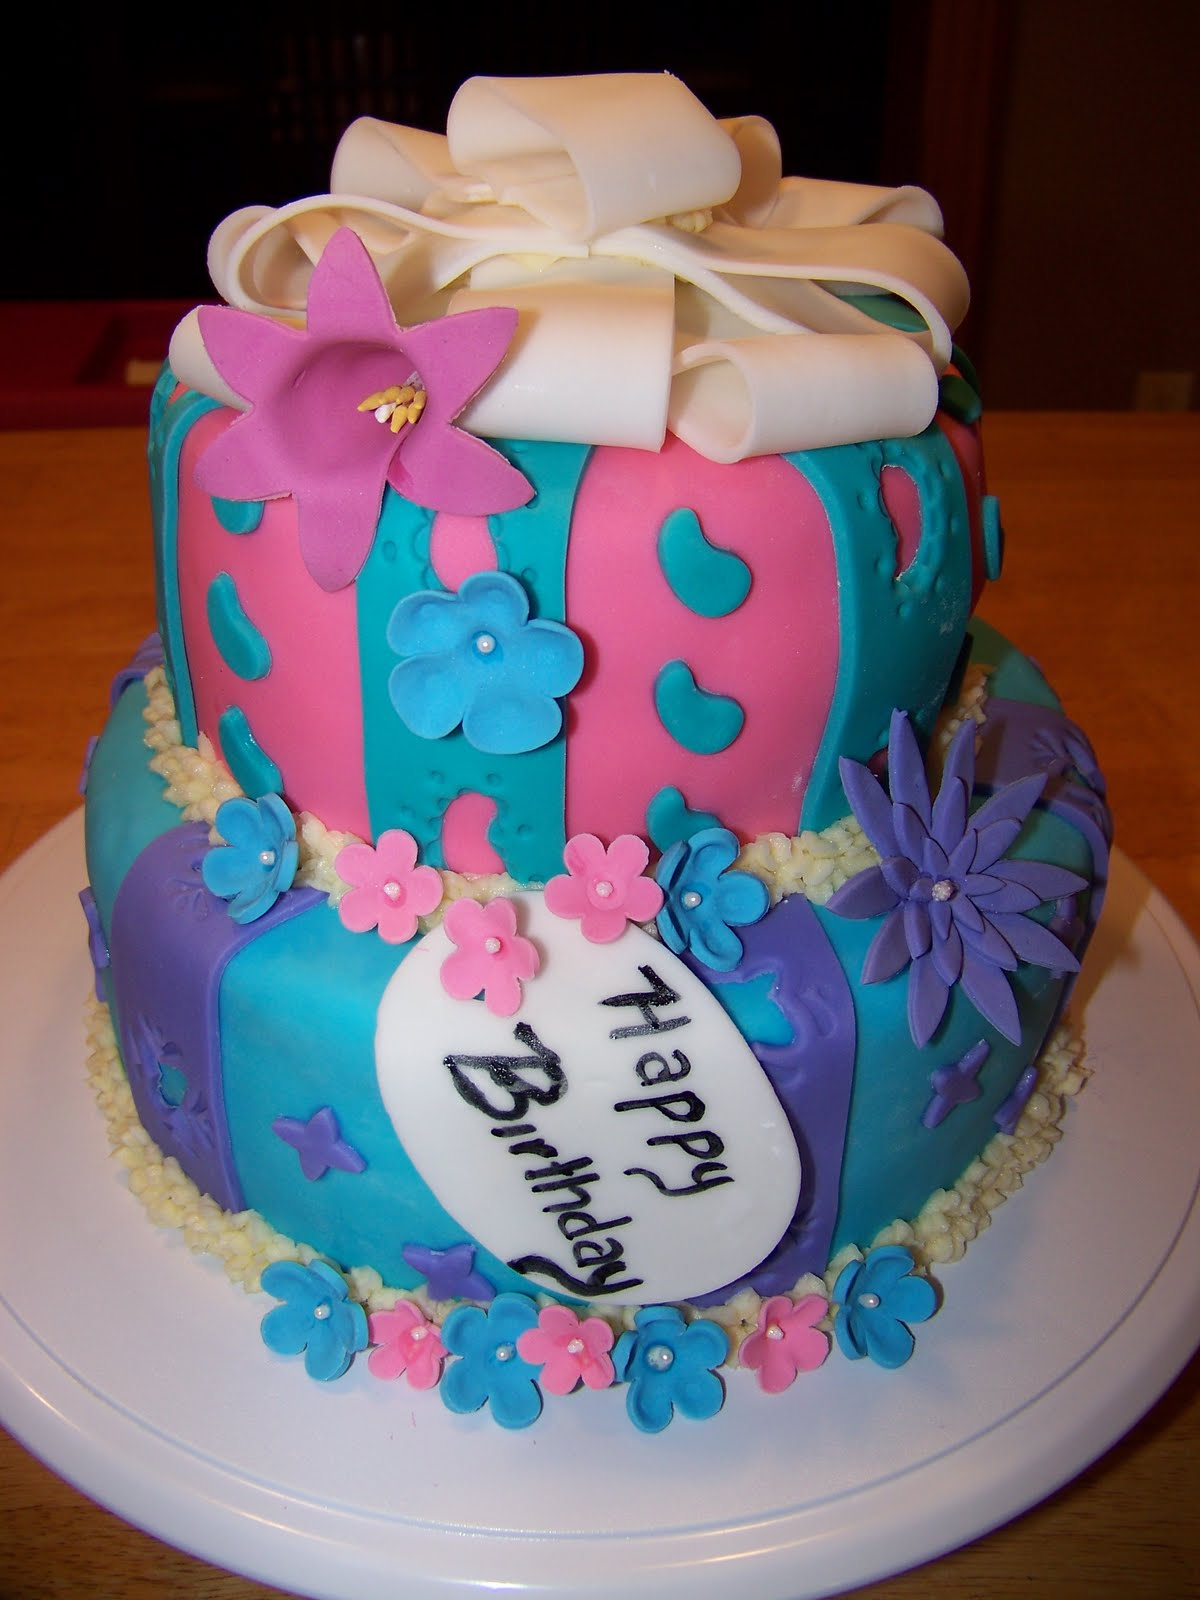 Nina's Cake Design: June 2011